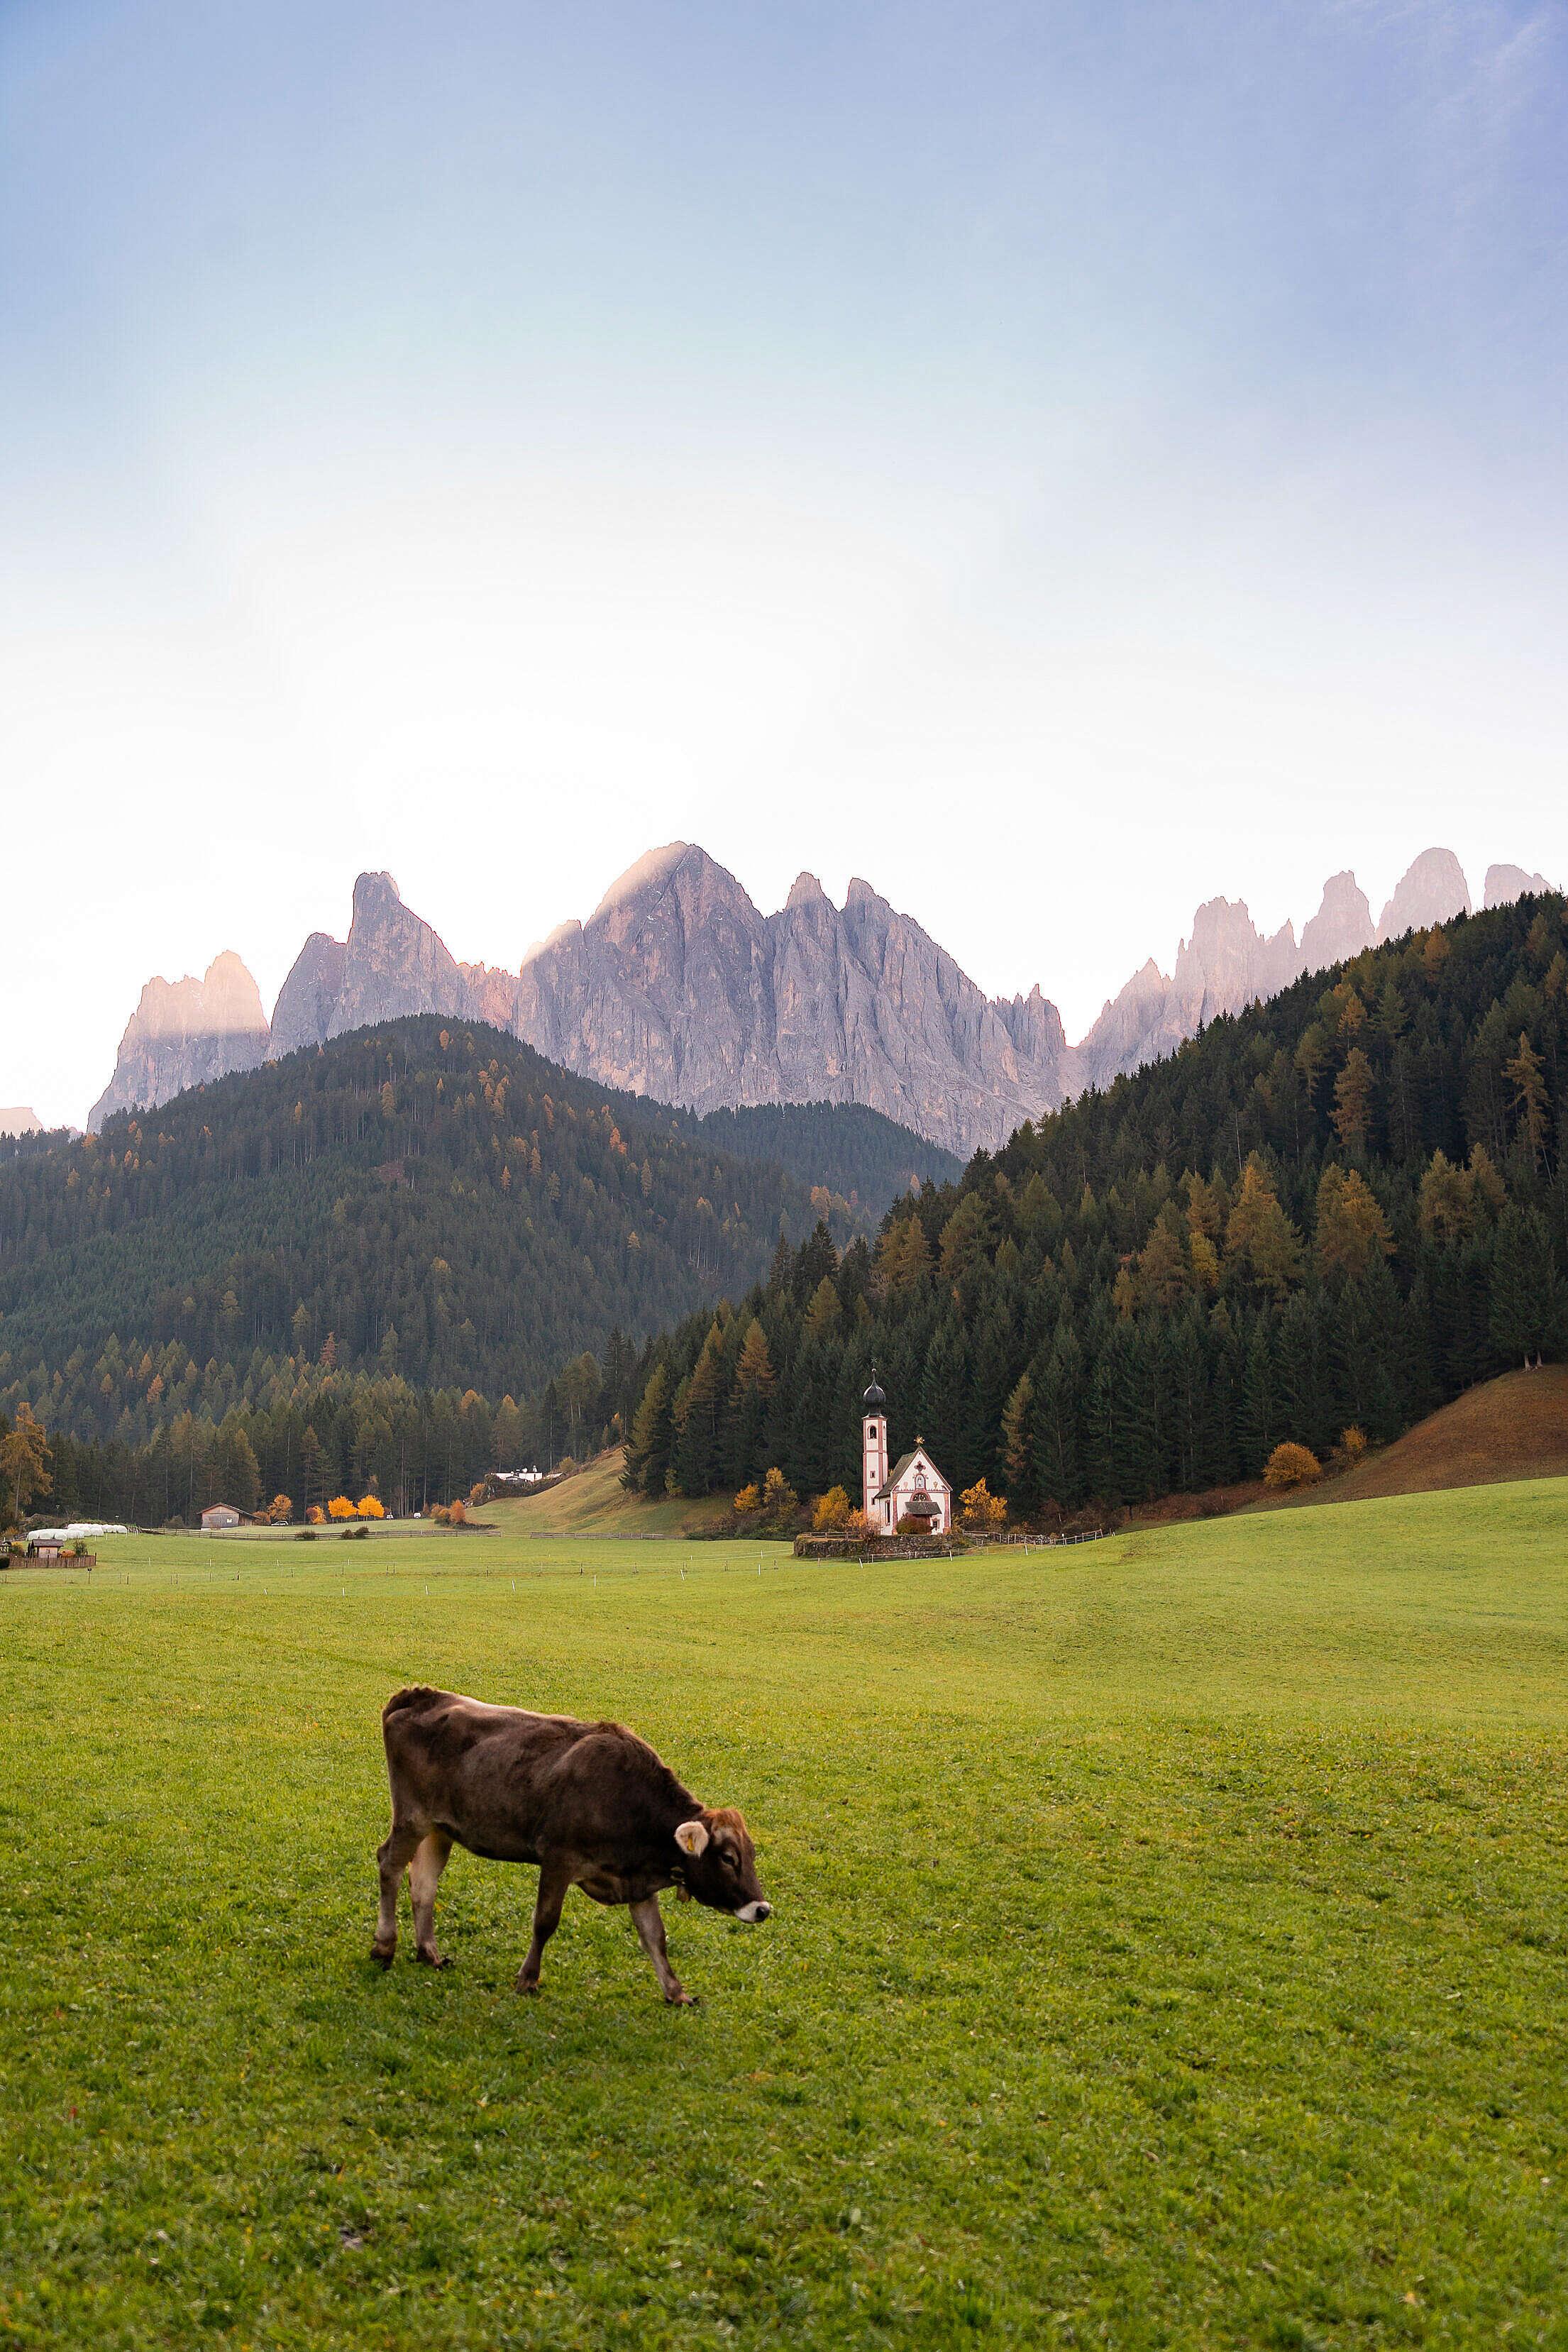 Grazing Cow near Church of St. John in Ranui, Italy Free Stock Photo